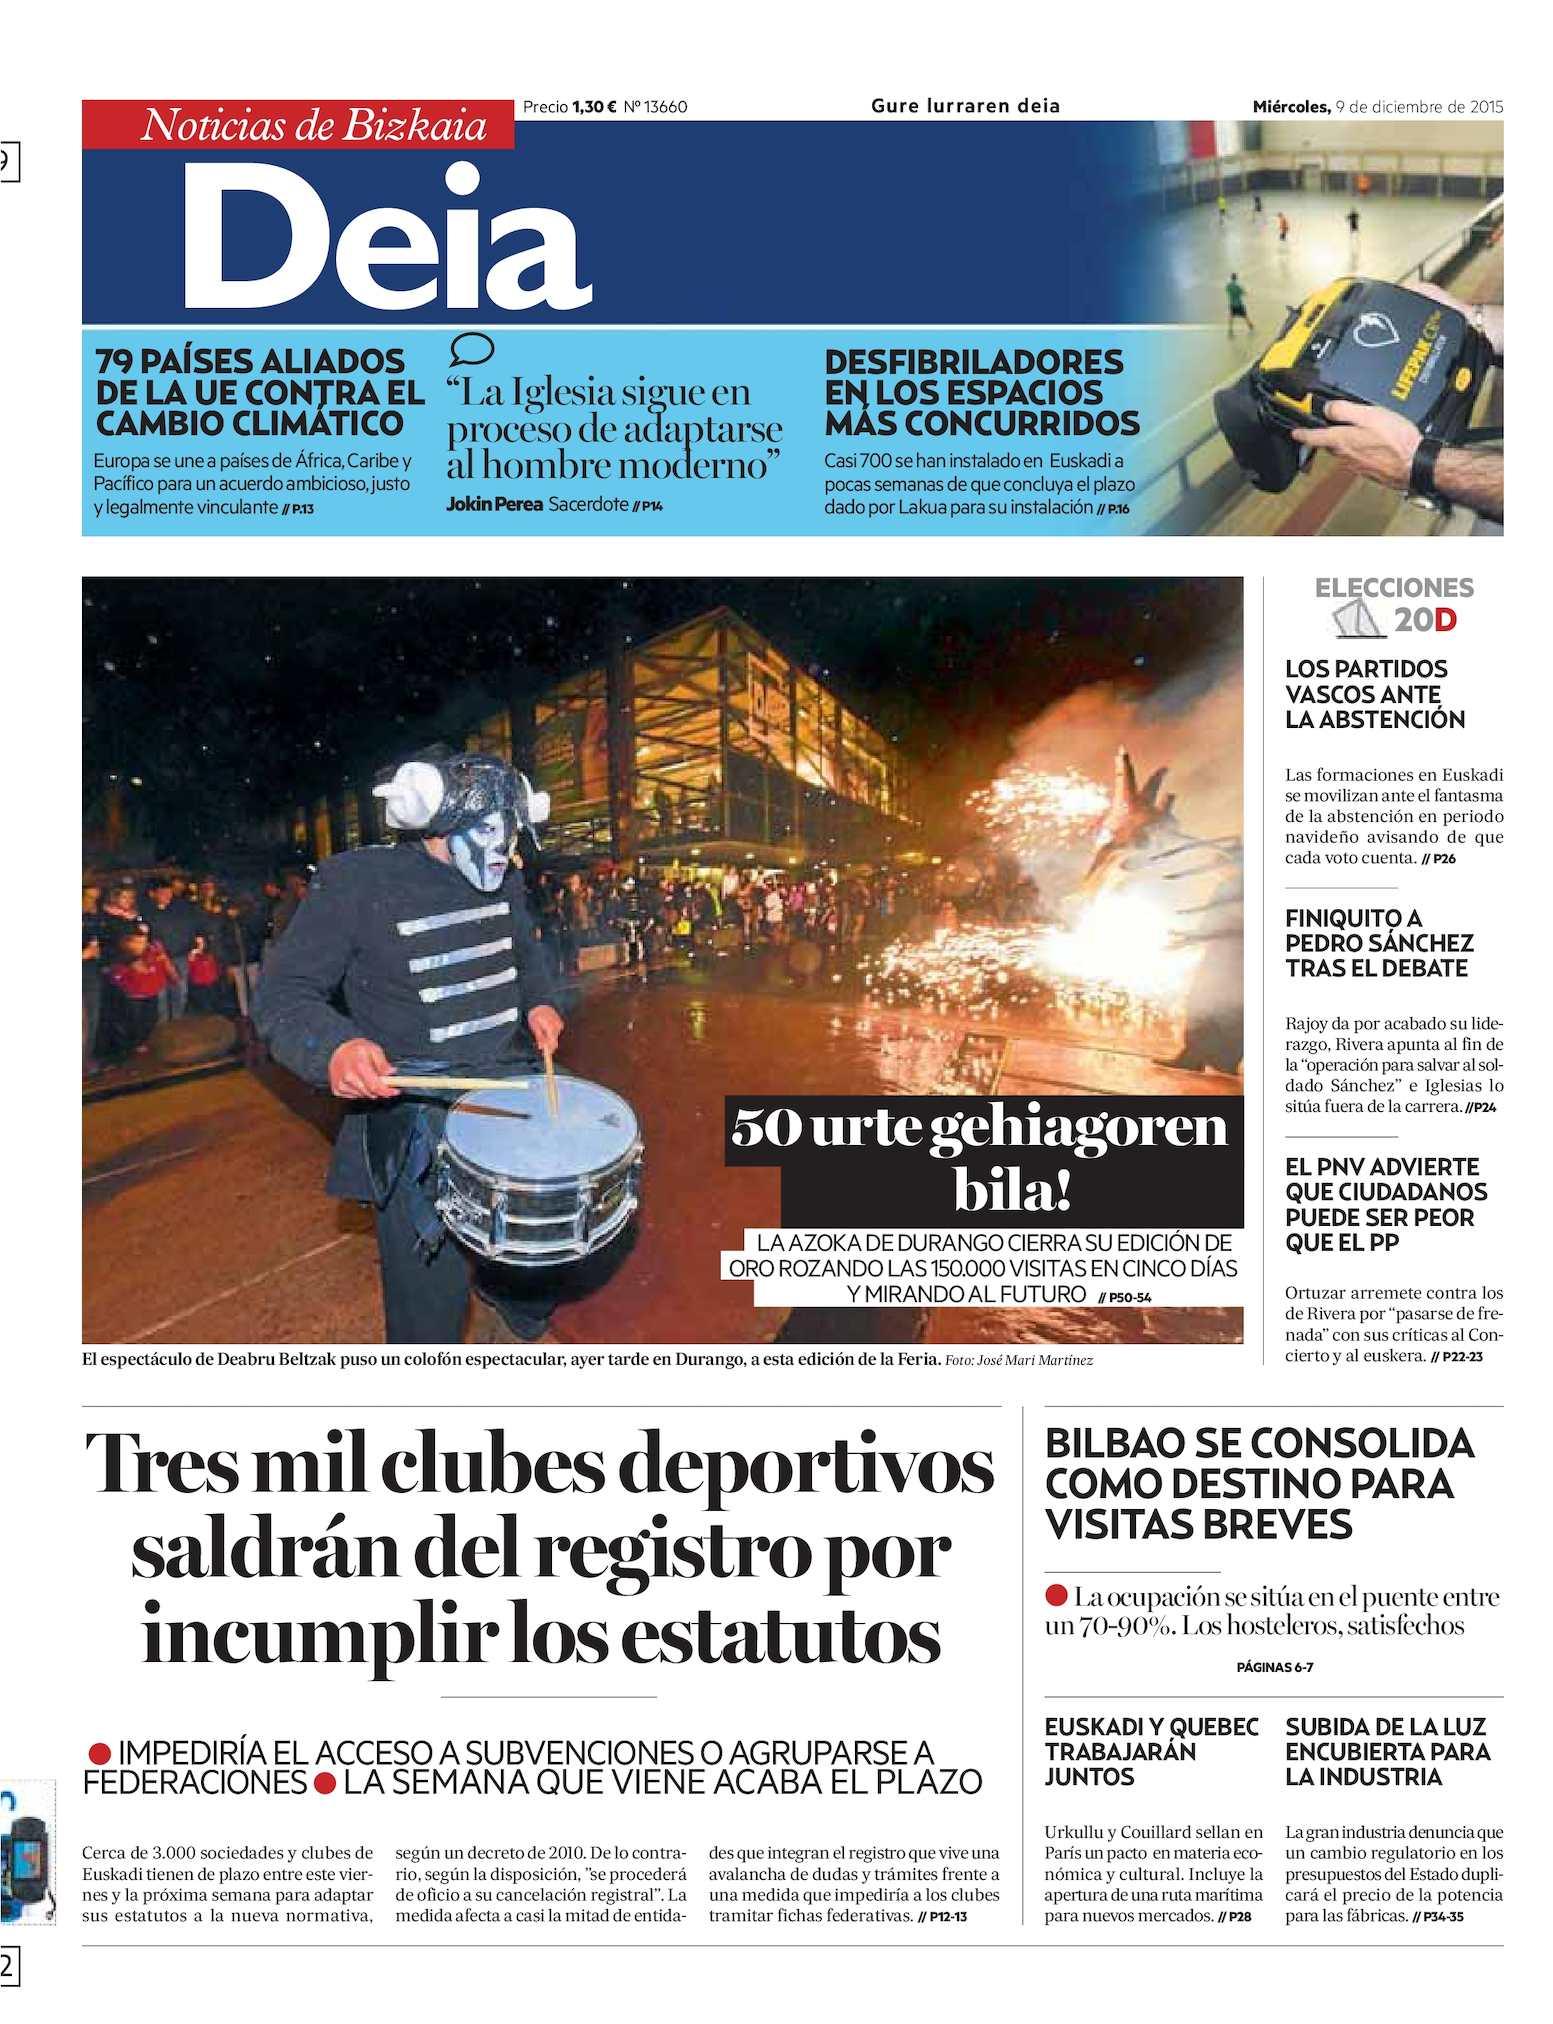 Calaméo - Deia 20151209